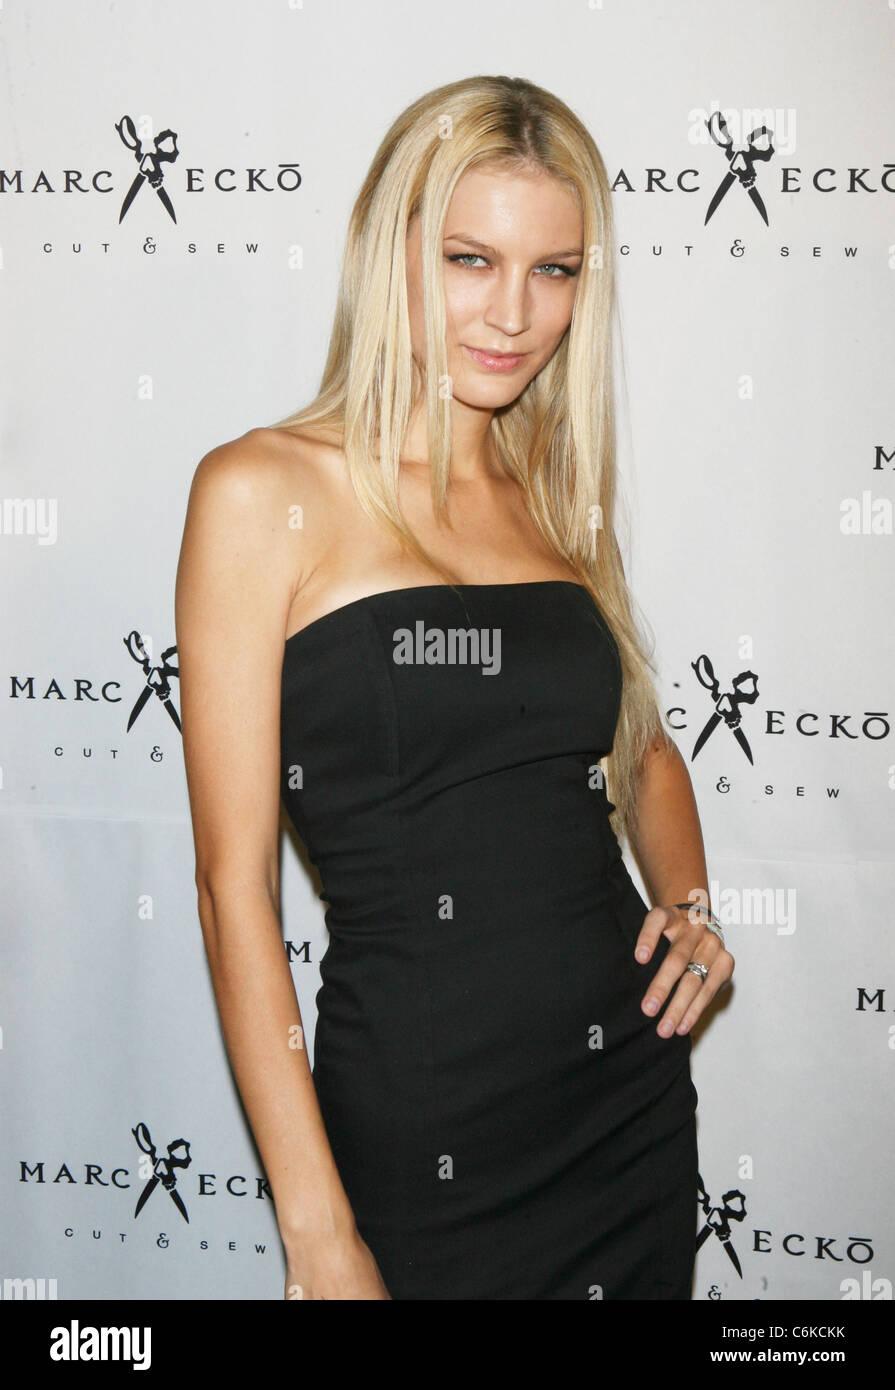 Shannon Rusbuldt